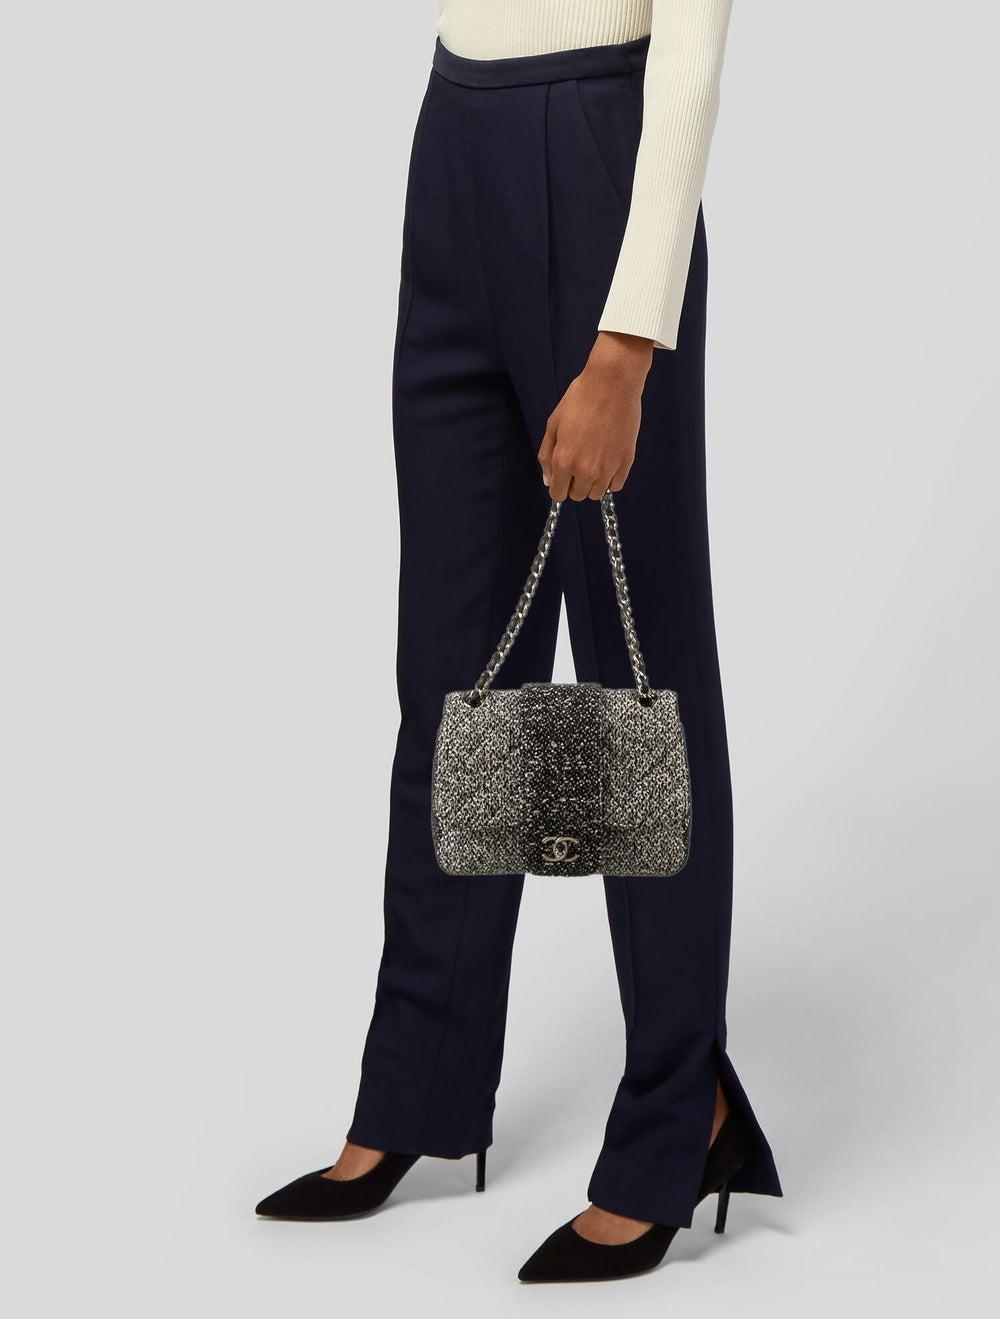 Chanel Tweed Elementary Chic Flap Bag Black - image 2